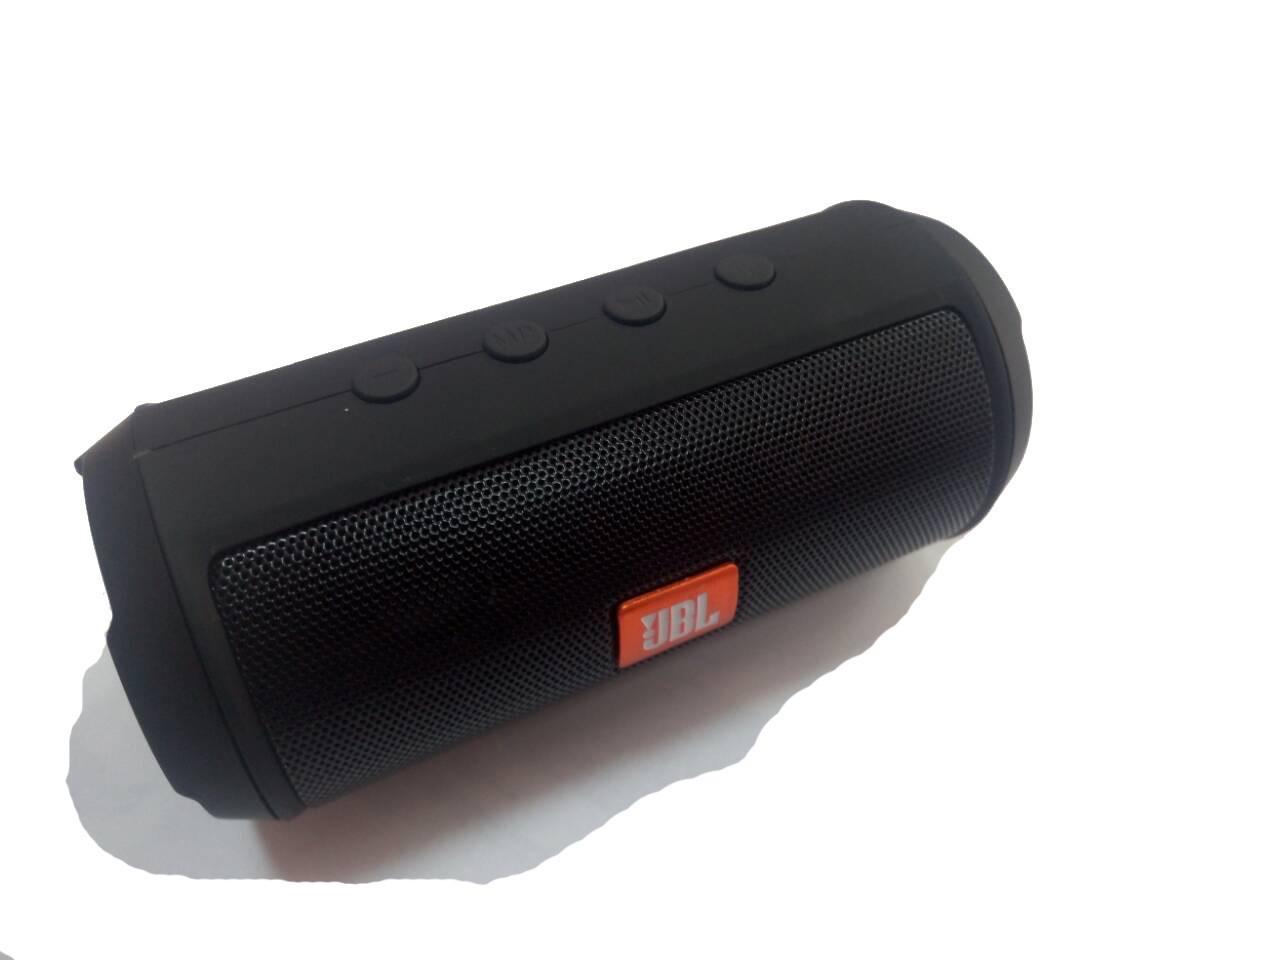 Портативна колонка JBL Charge mini 2, чорна, репліка